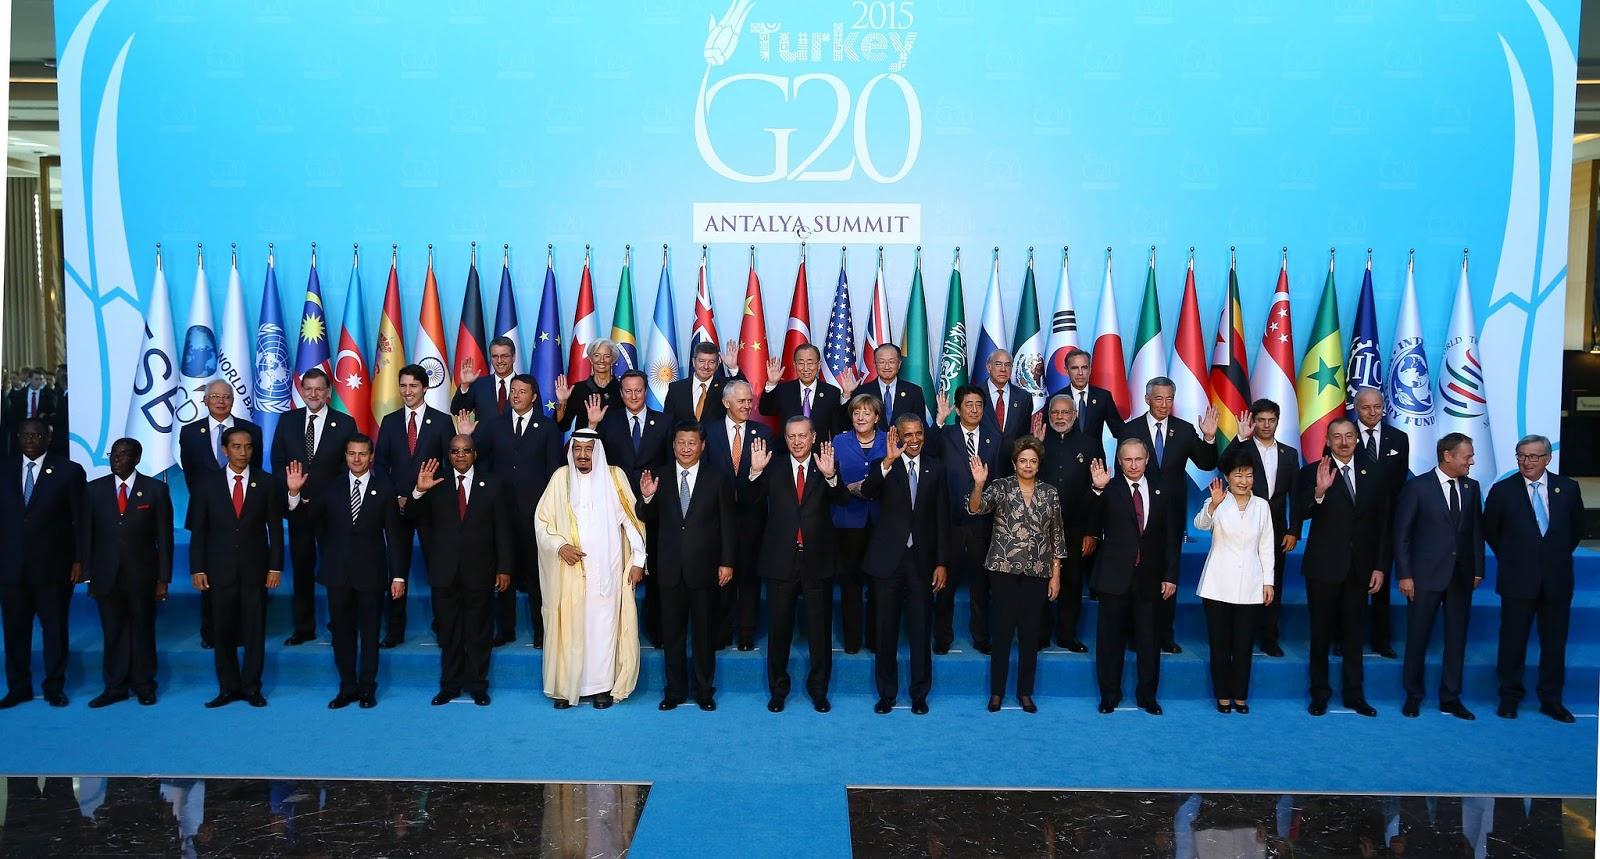 g20 summit application